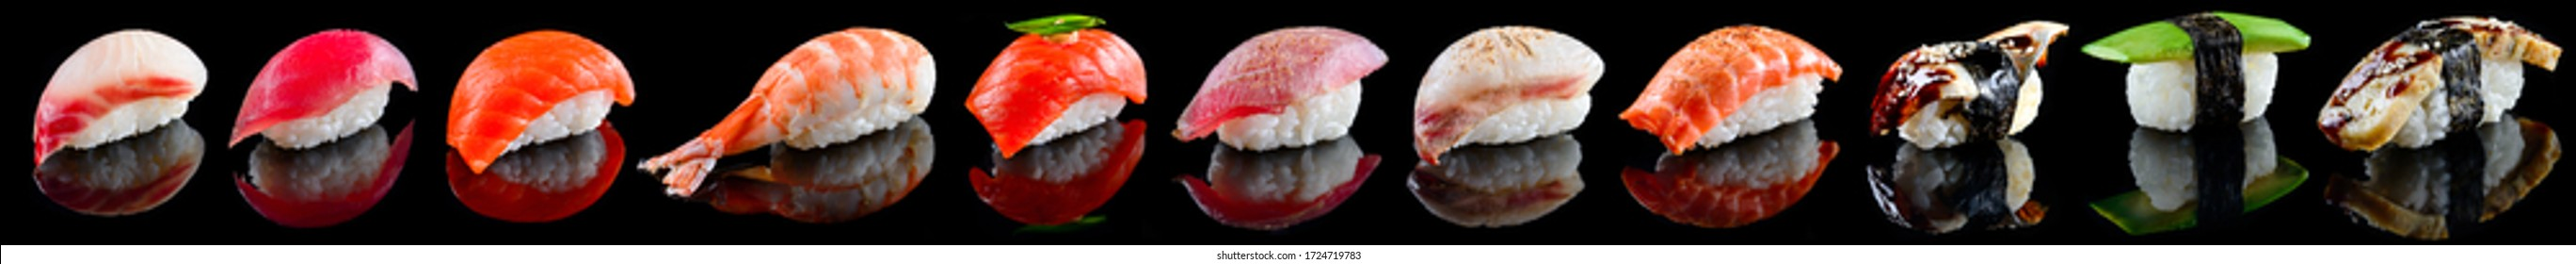 Set Nigiri sushi set with tuna, salmon, prawns, sea bass. sushi nigiri collection on Black background, reflection, high resolution